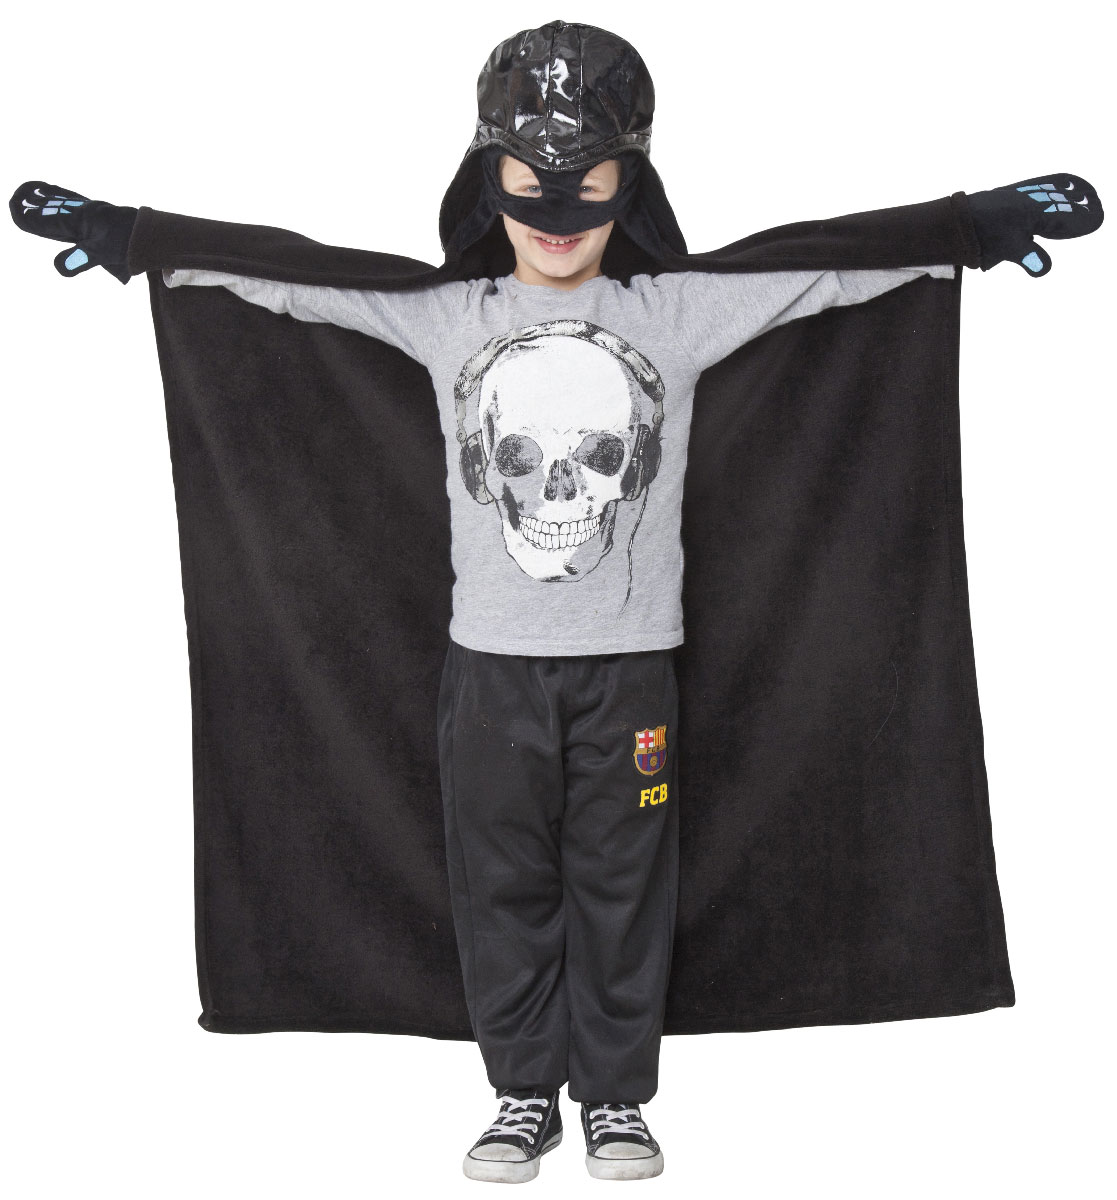 Star Wars Плед детский с капюшоном Darth Vader 100 см х 100 см